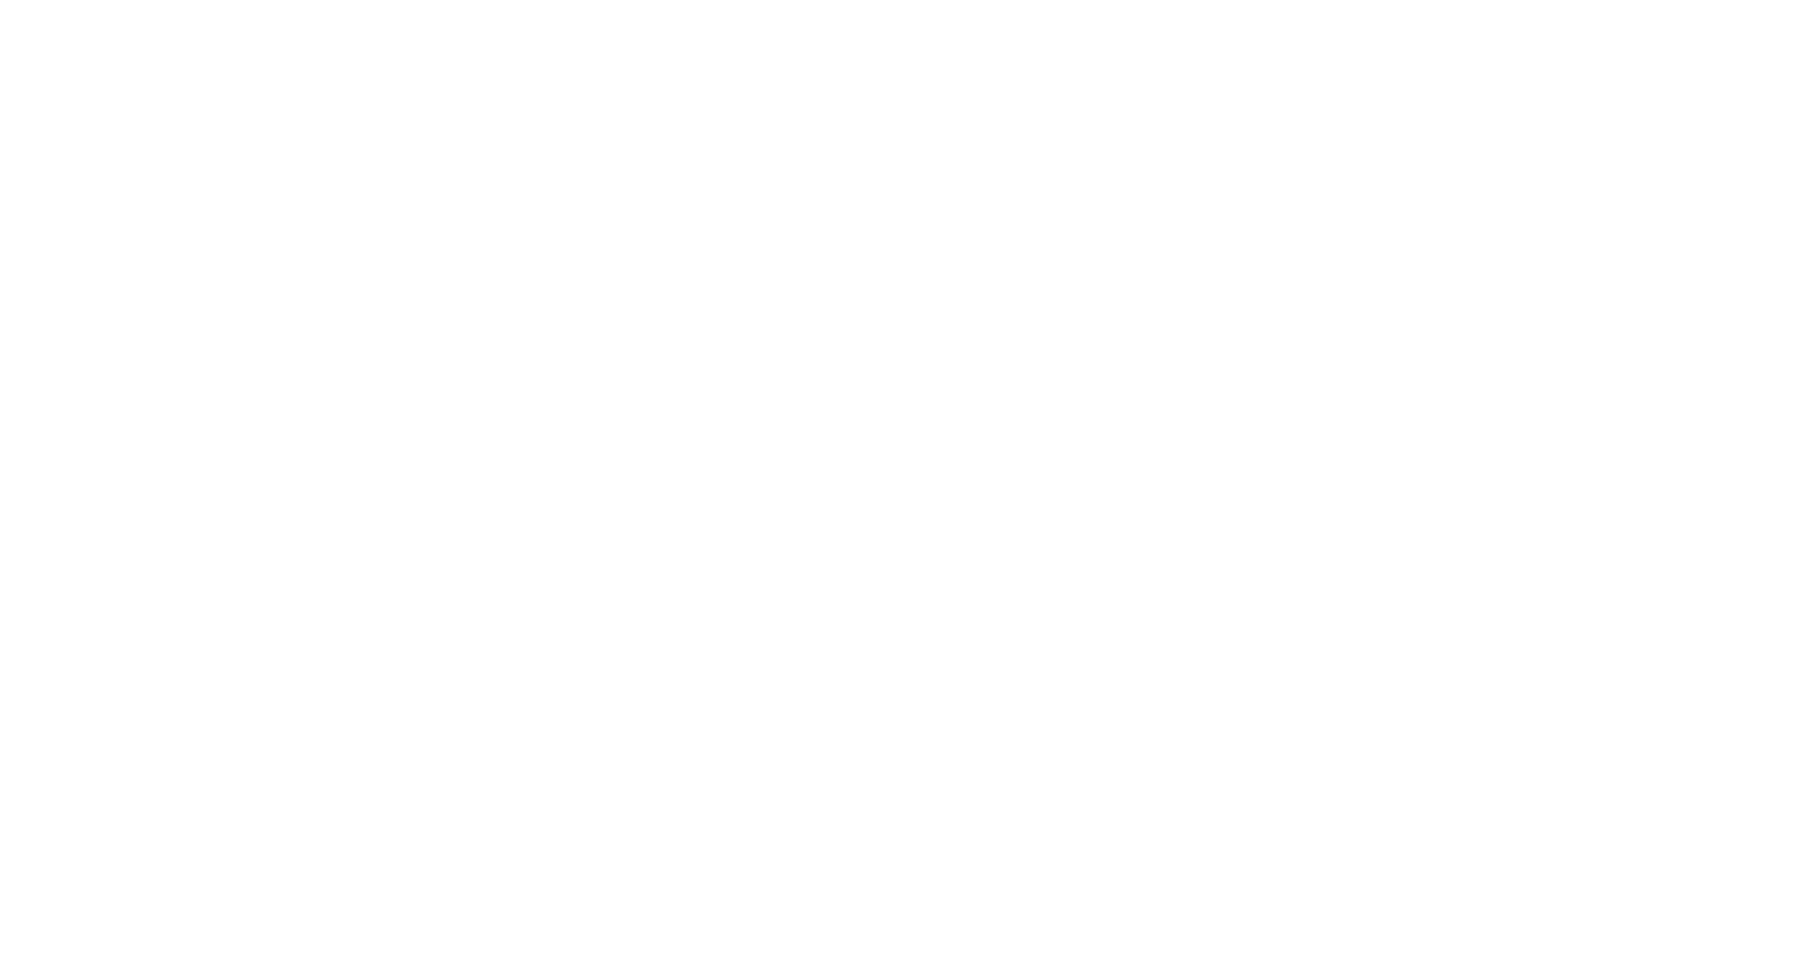 http://smc.com.mx/wp-content/uploads/2020/02/SMC-Slogan.png